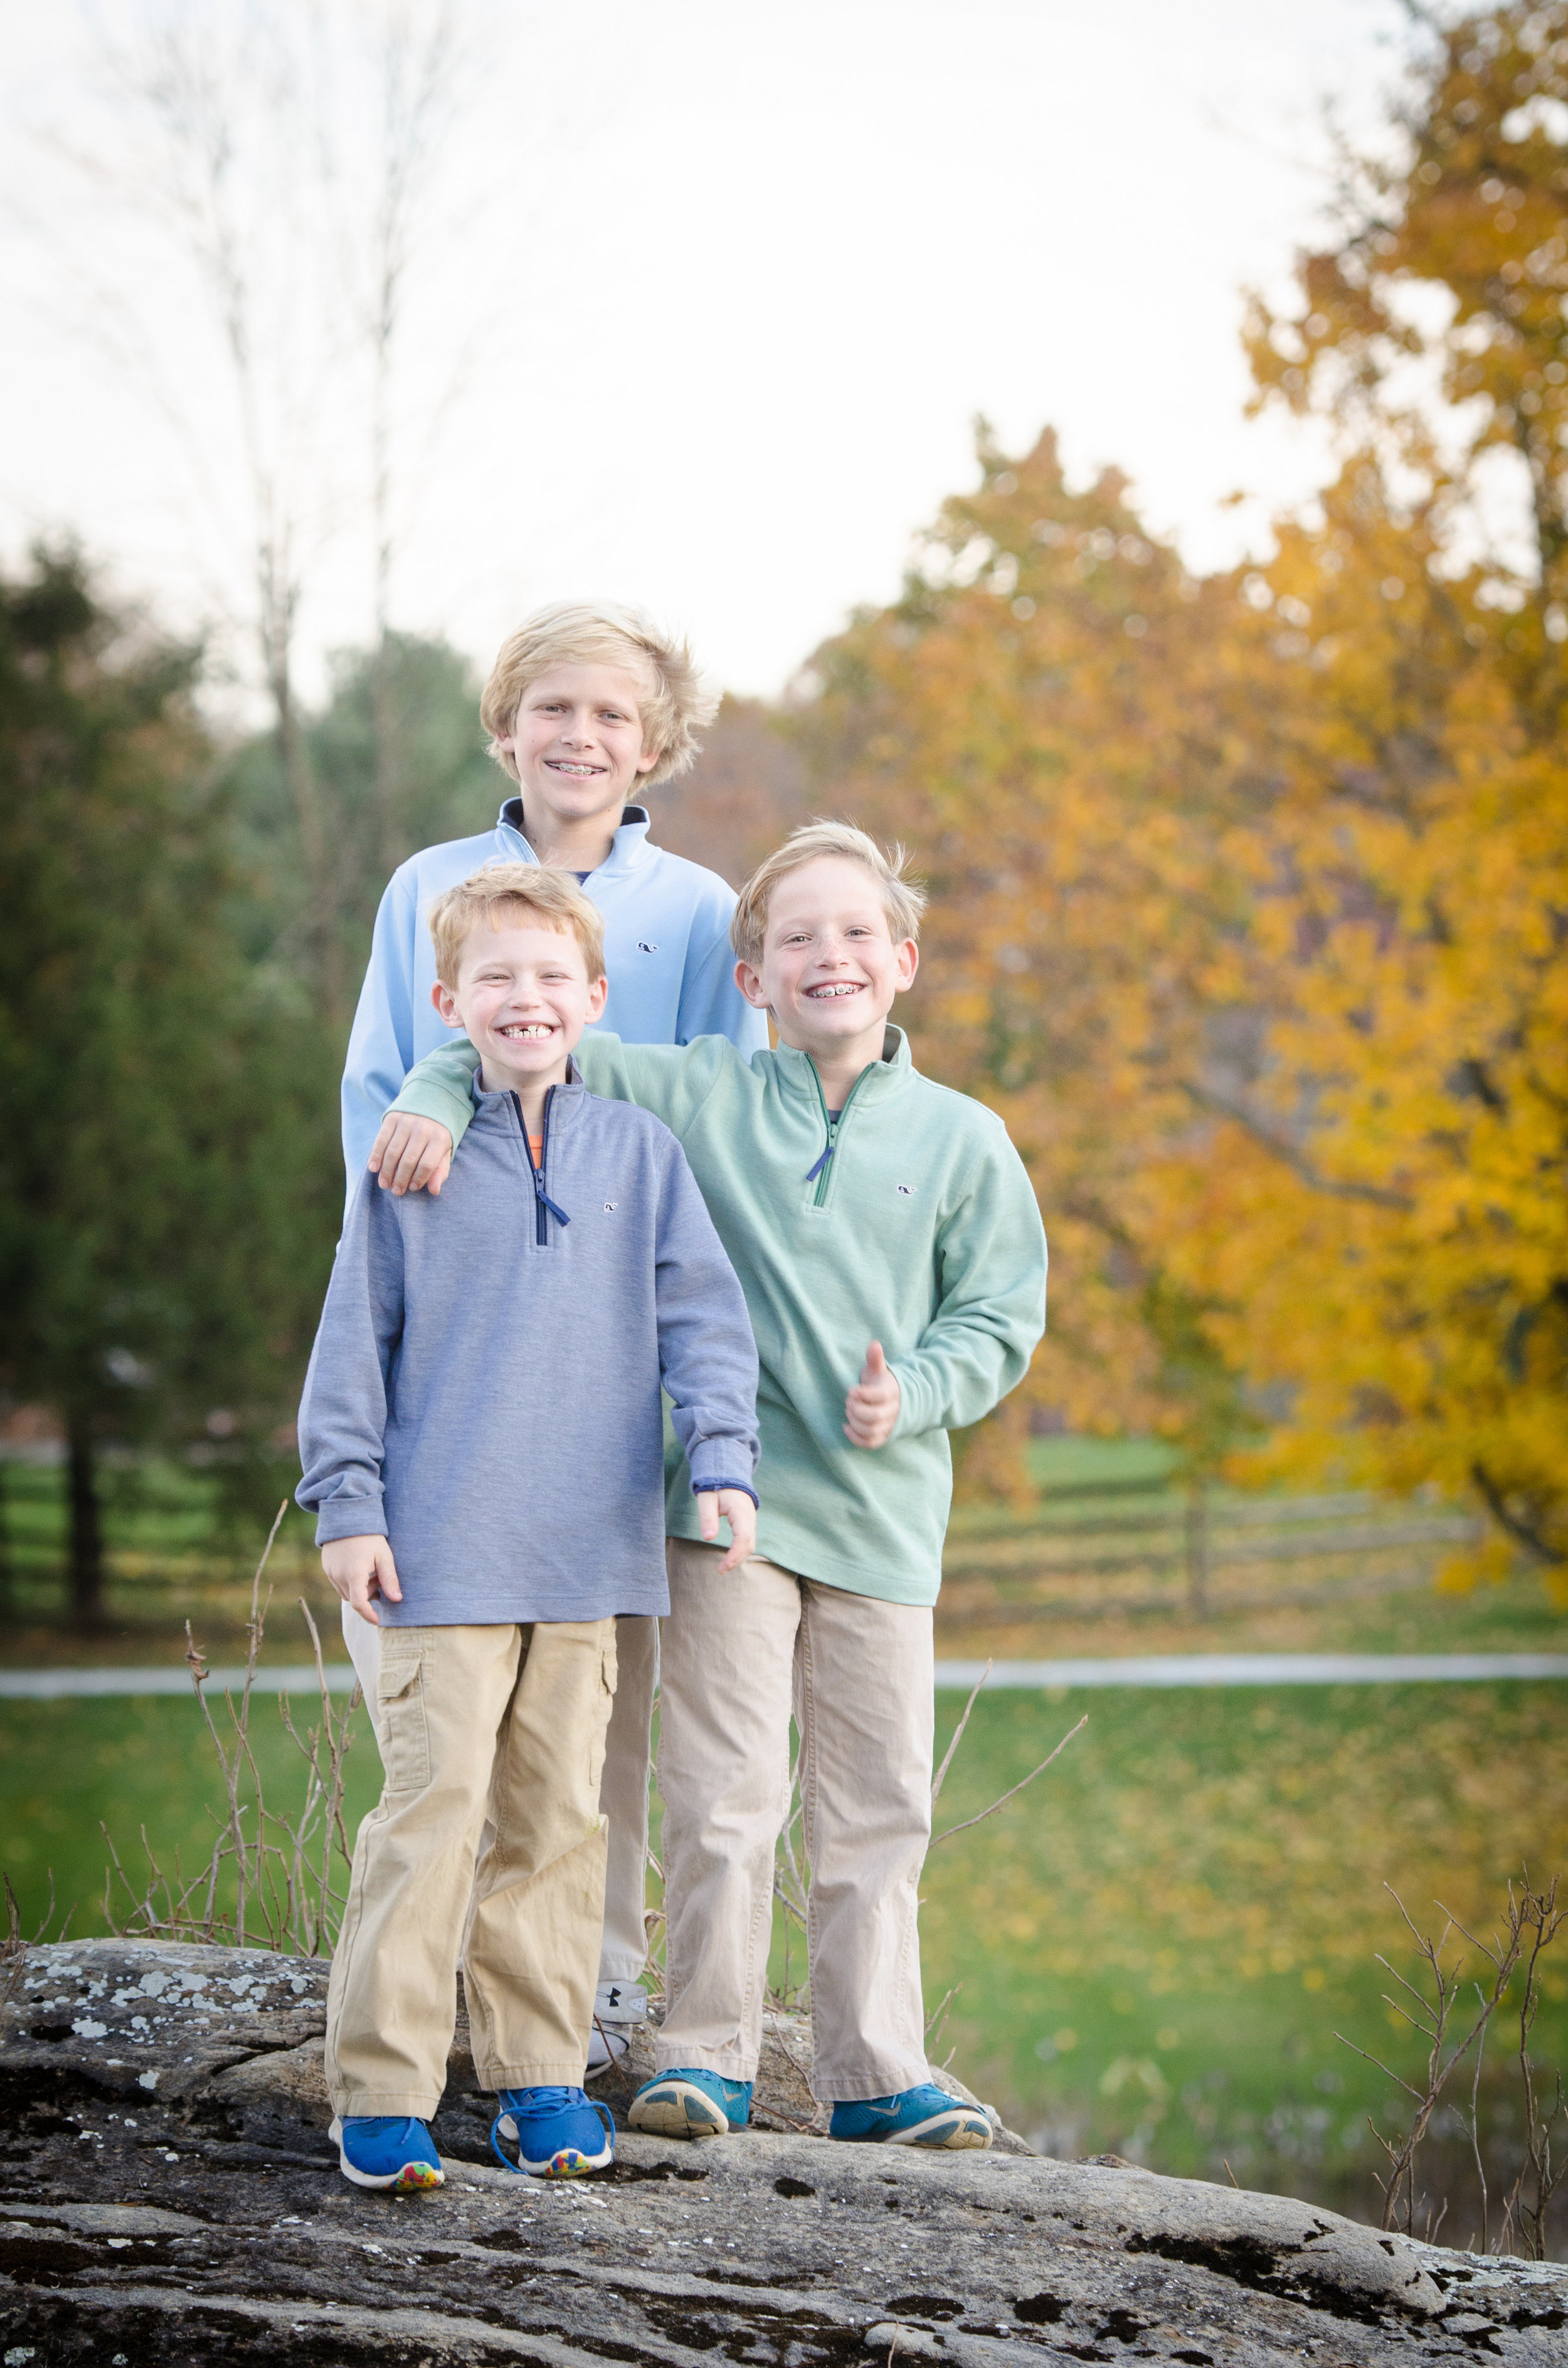 Hook Family Portraits-Hook Family Portraits-0003.jpg